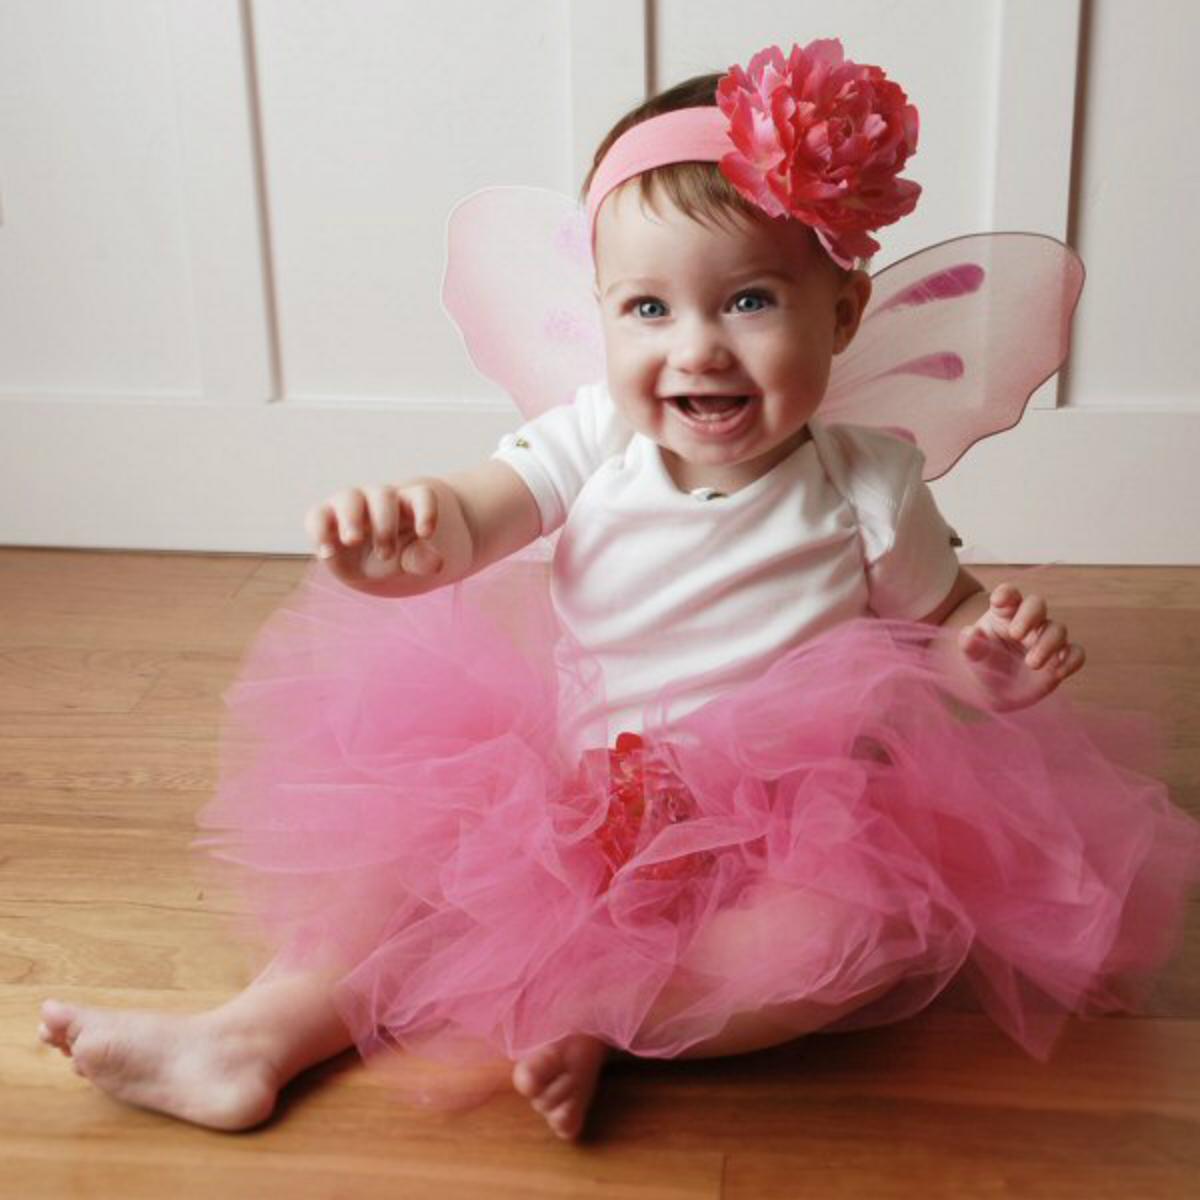 baby-girl-easter-dress-pink-tutu01  sc 1 st  Fairytale Tutus & Turquoise Fairy Ballerina Tulle Dress-Up Costume Tutu - Fairytale Tutus